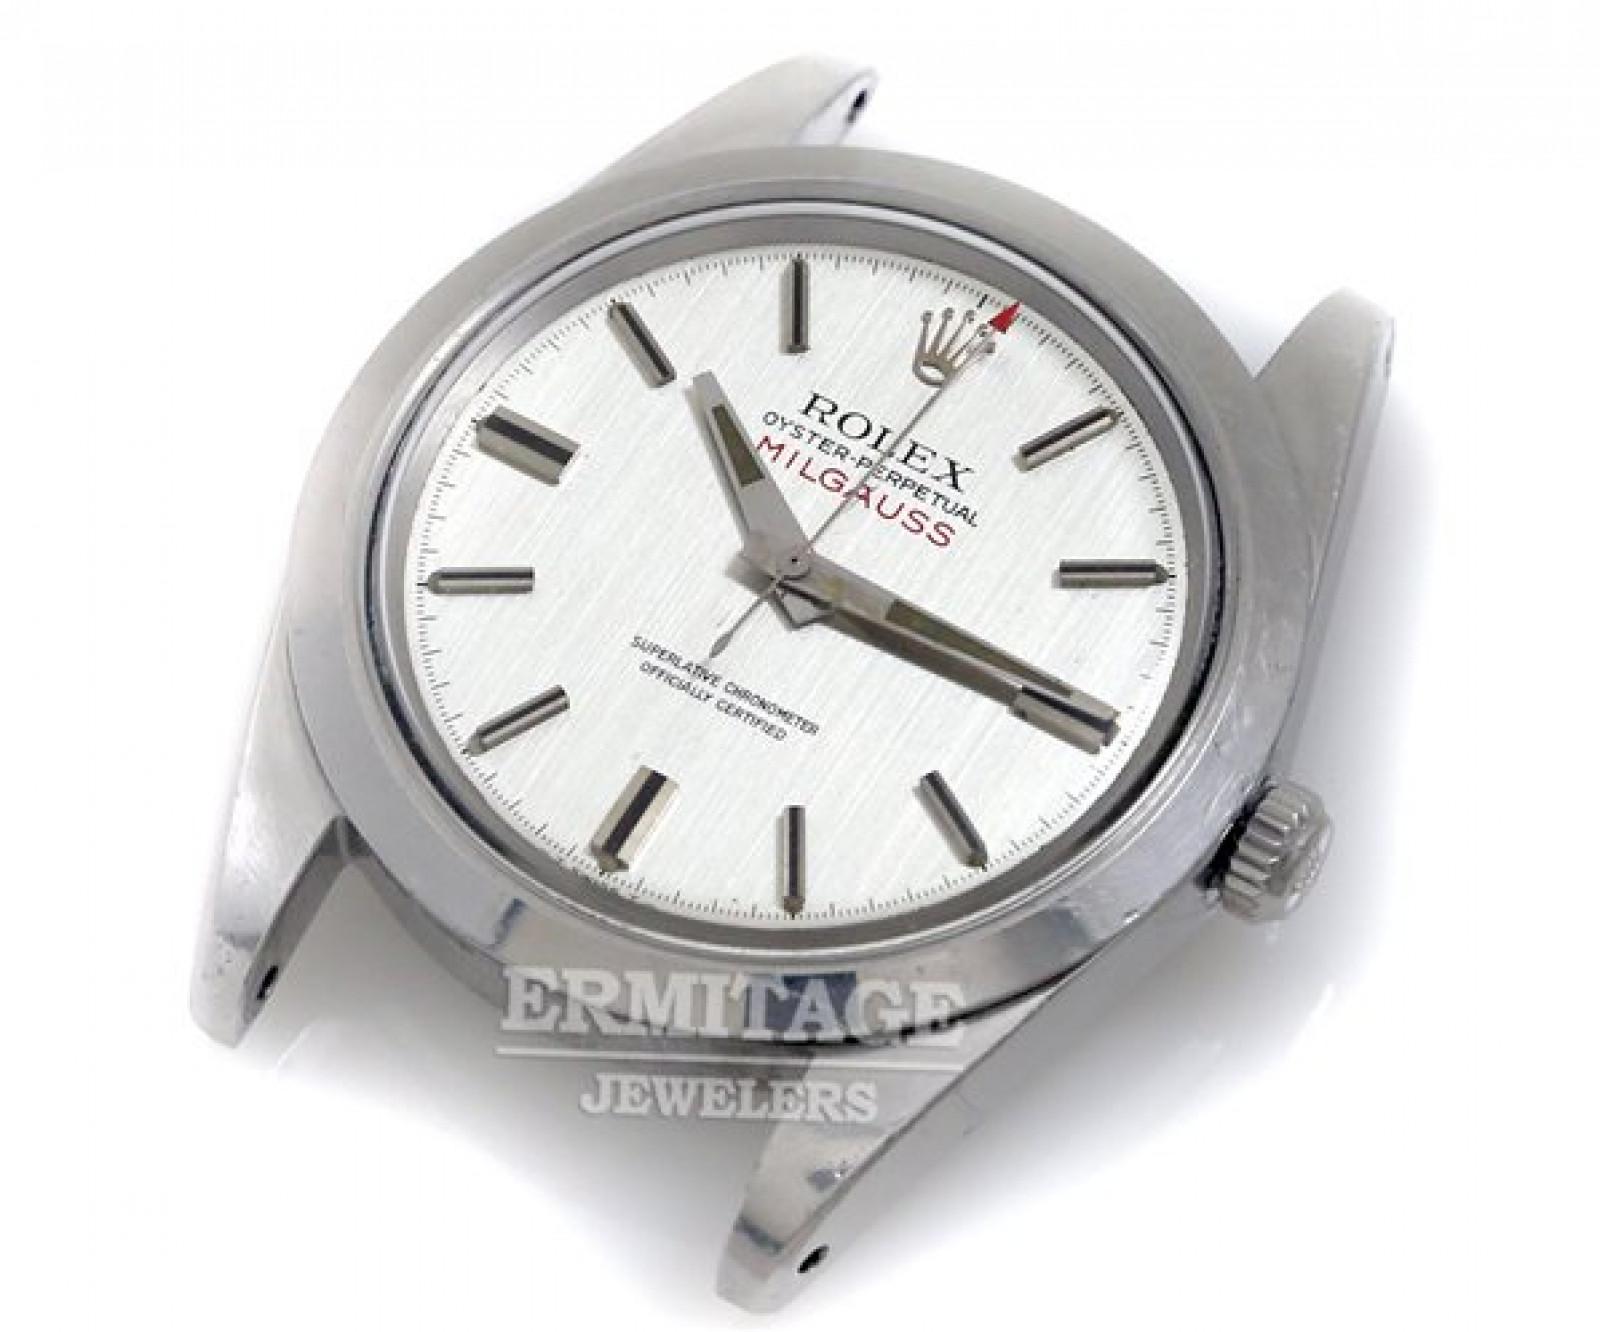 Vintage Rolex Milgauss 1019 Steel with Grey Dial